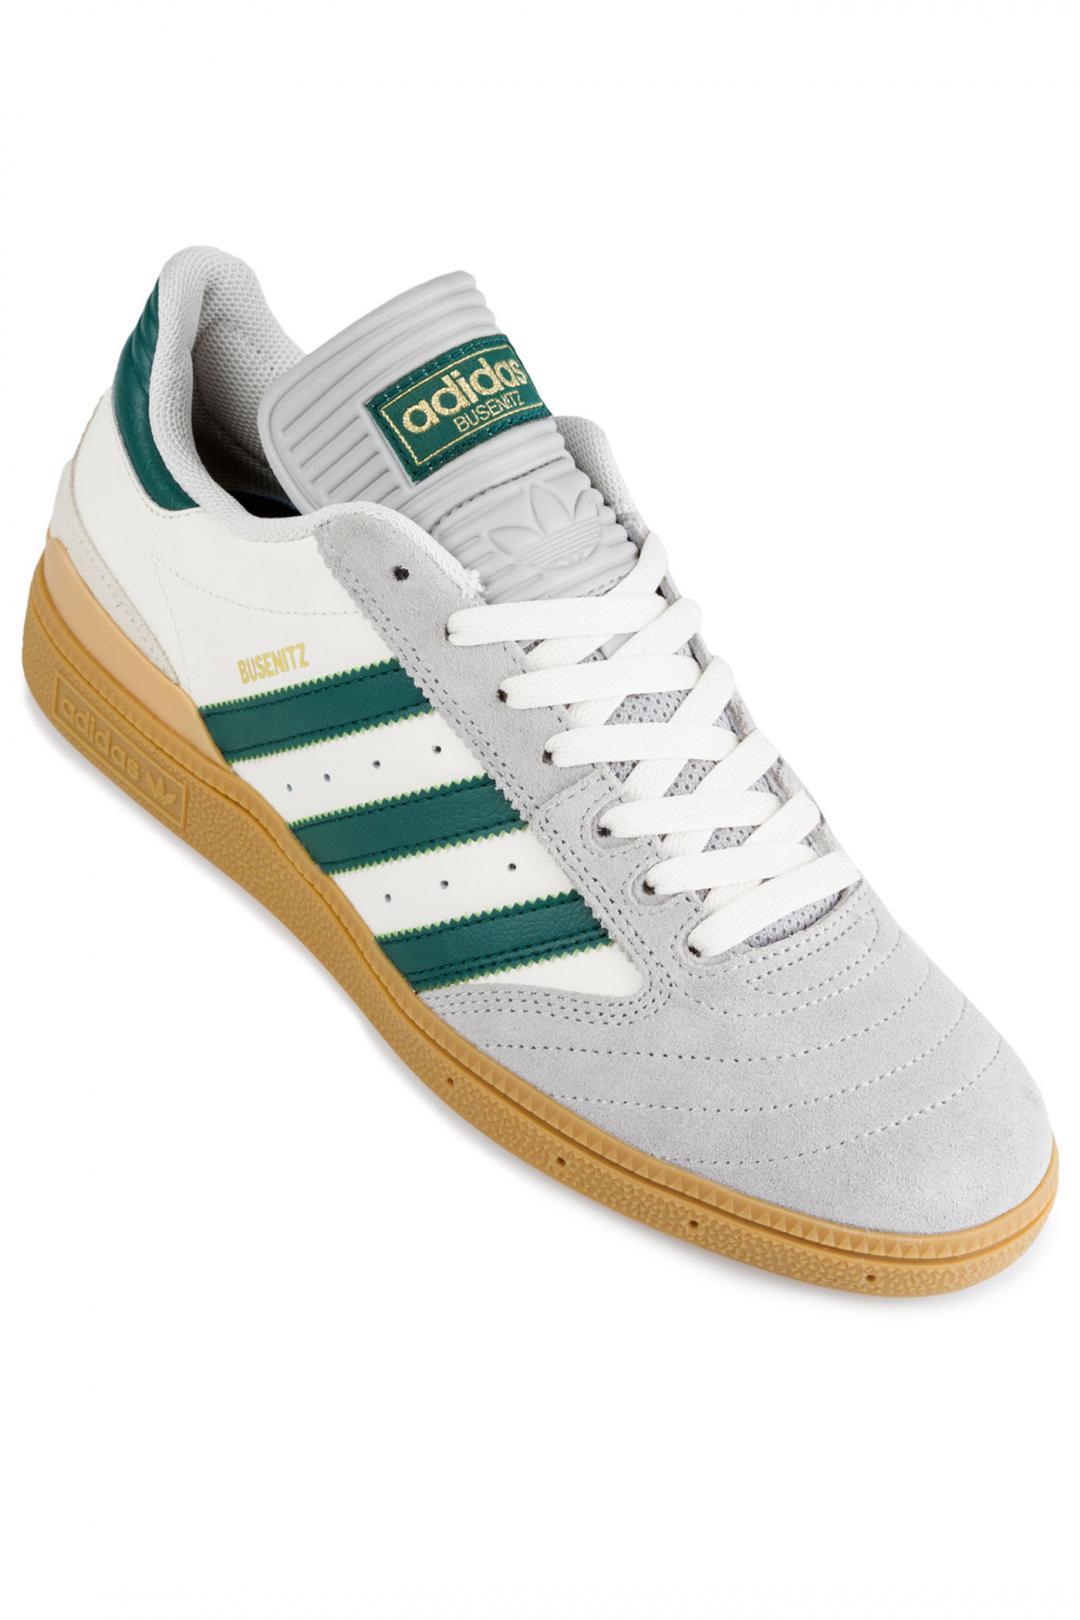 Uomo adidas Skateboarding Busenitz grey collegiate green gum   Sneakers low top